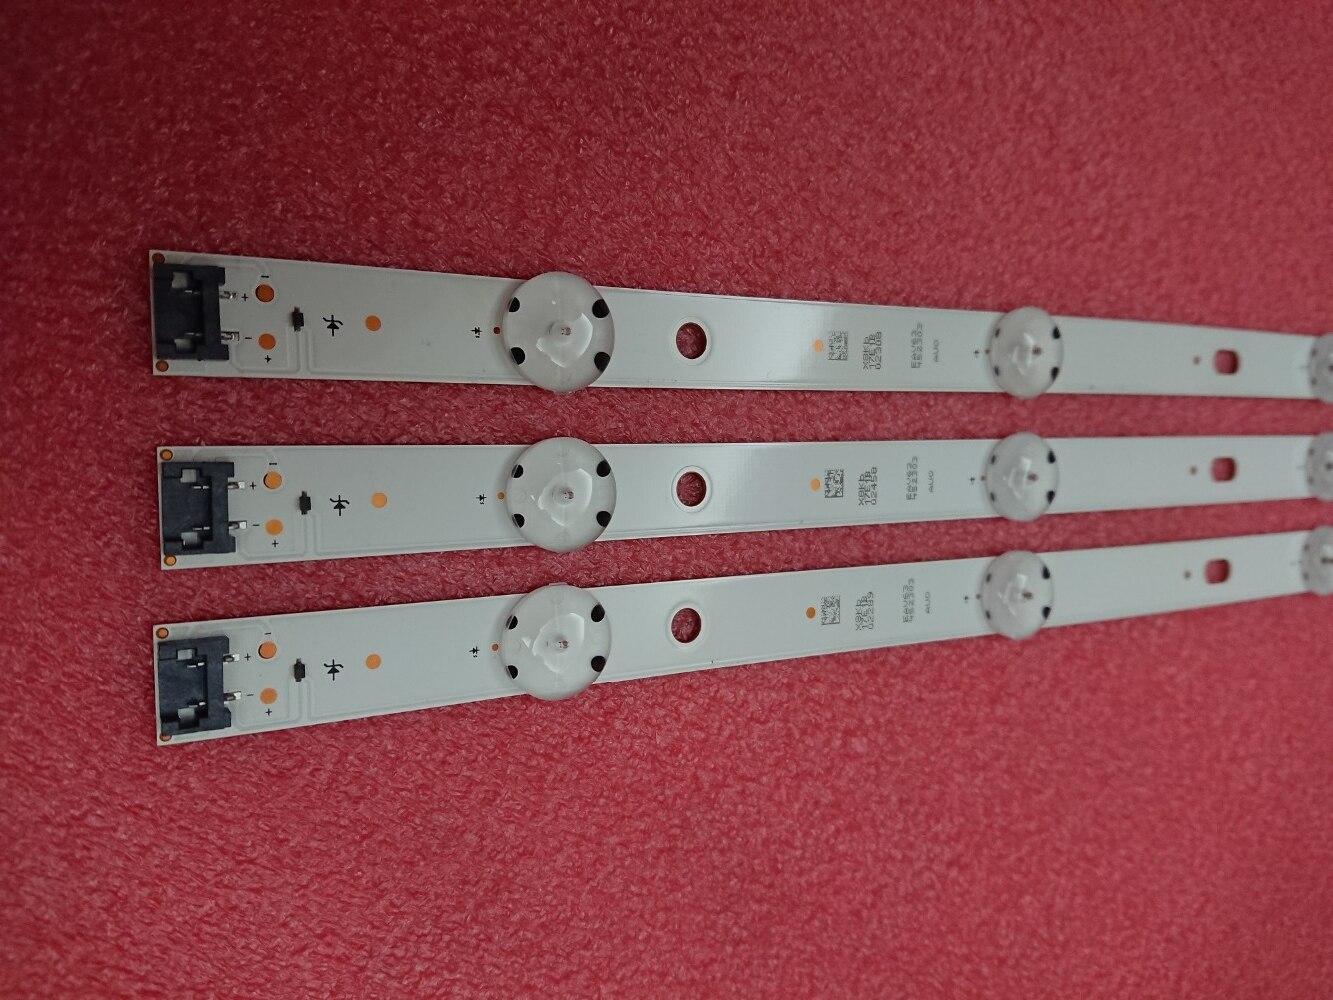 (Nuevo Kit) 3 unids 8LED 850mm de retroiluminación LED para LG 43UH6030 43UF640 HC430DGN-SLNX1 UF64_UHD_A 43LH60FHD EAV63192501